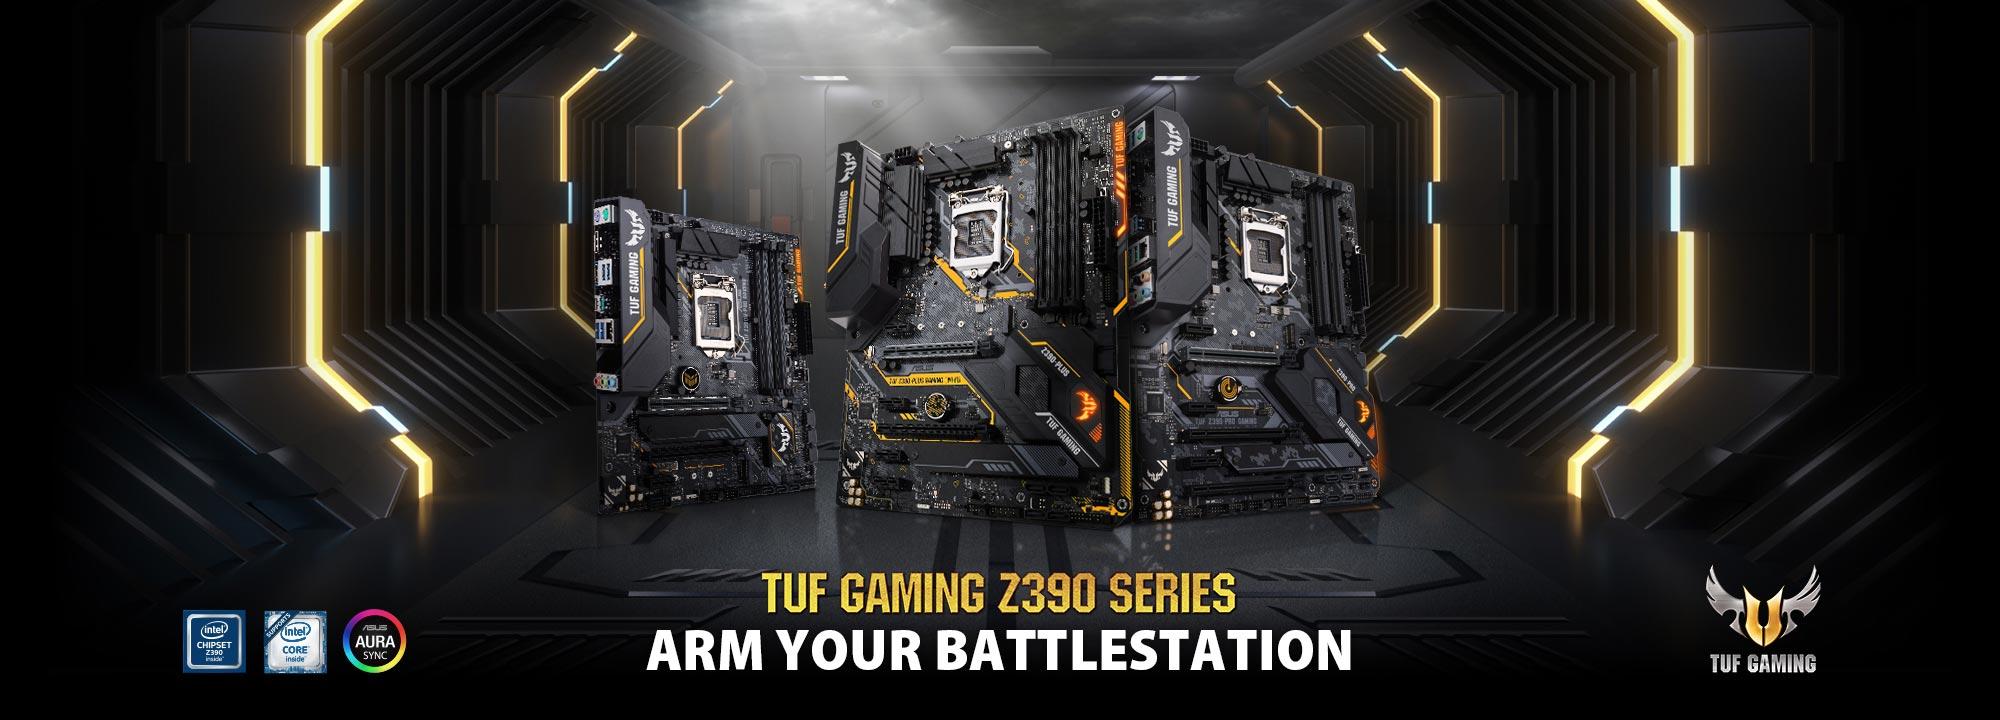 Asus TUF Gaming Z390 Series Motherboard